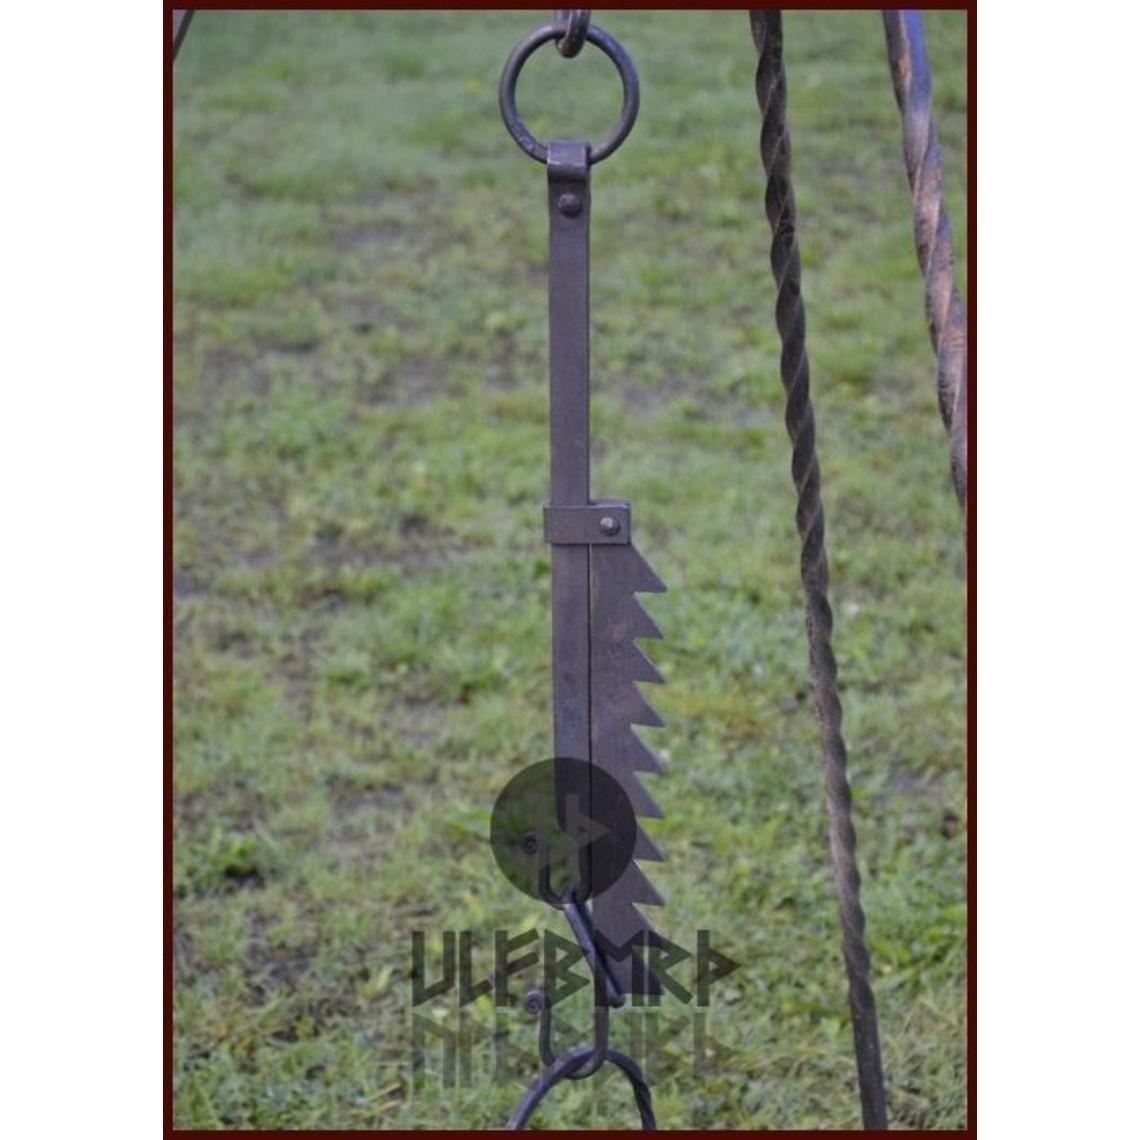 Ulfberth Medieval S-Haken 90 cm